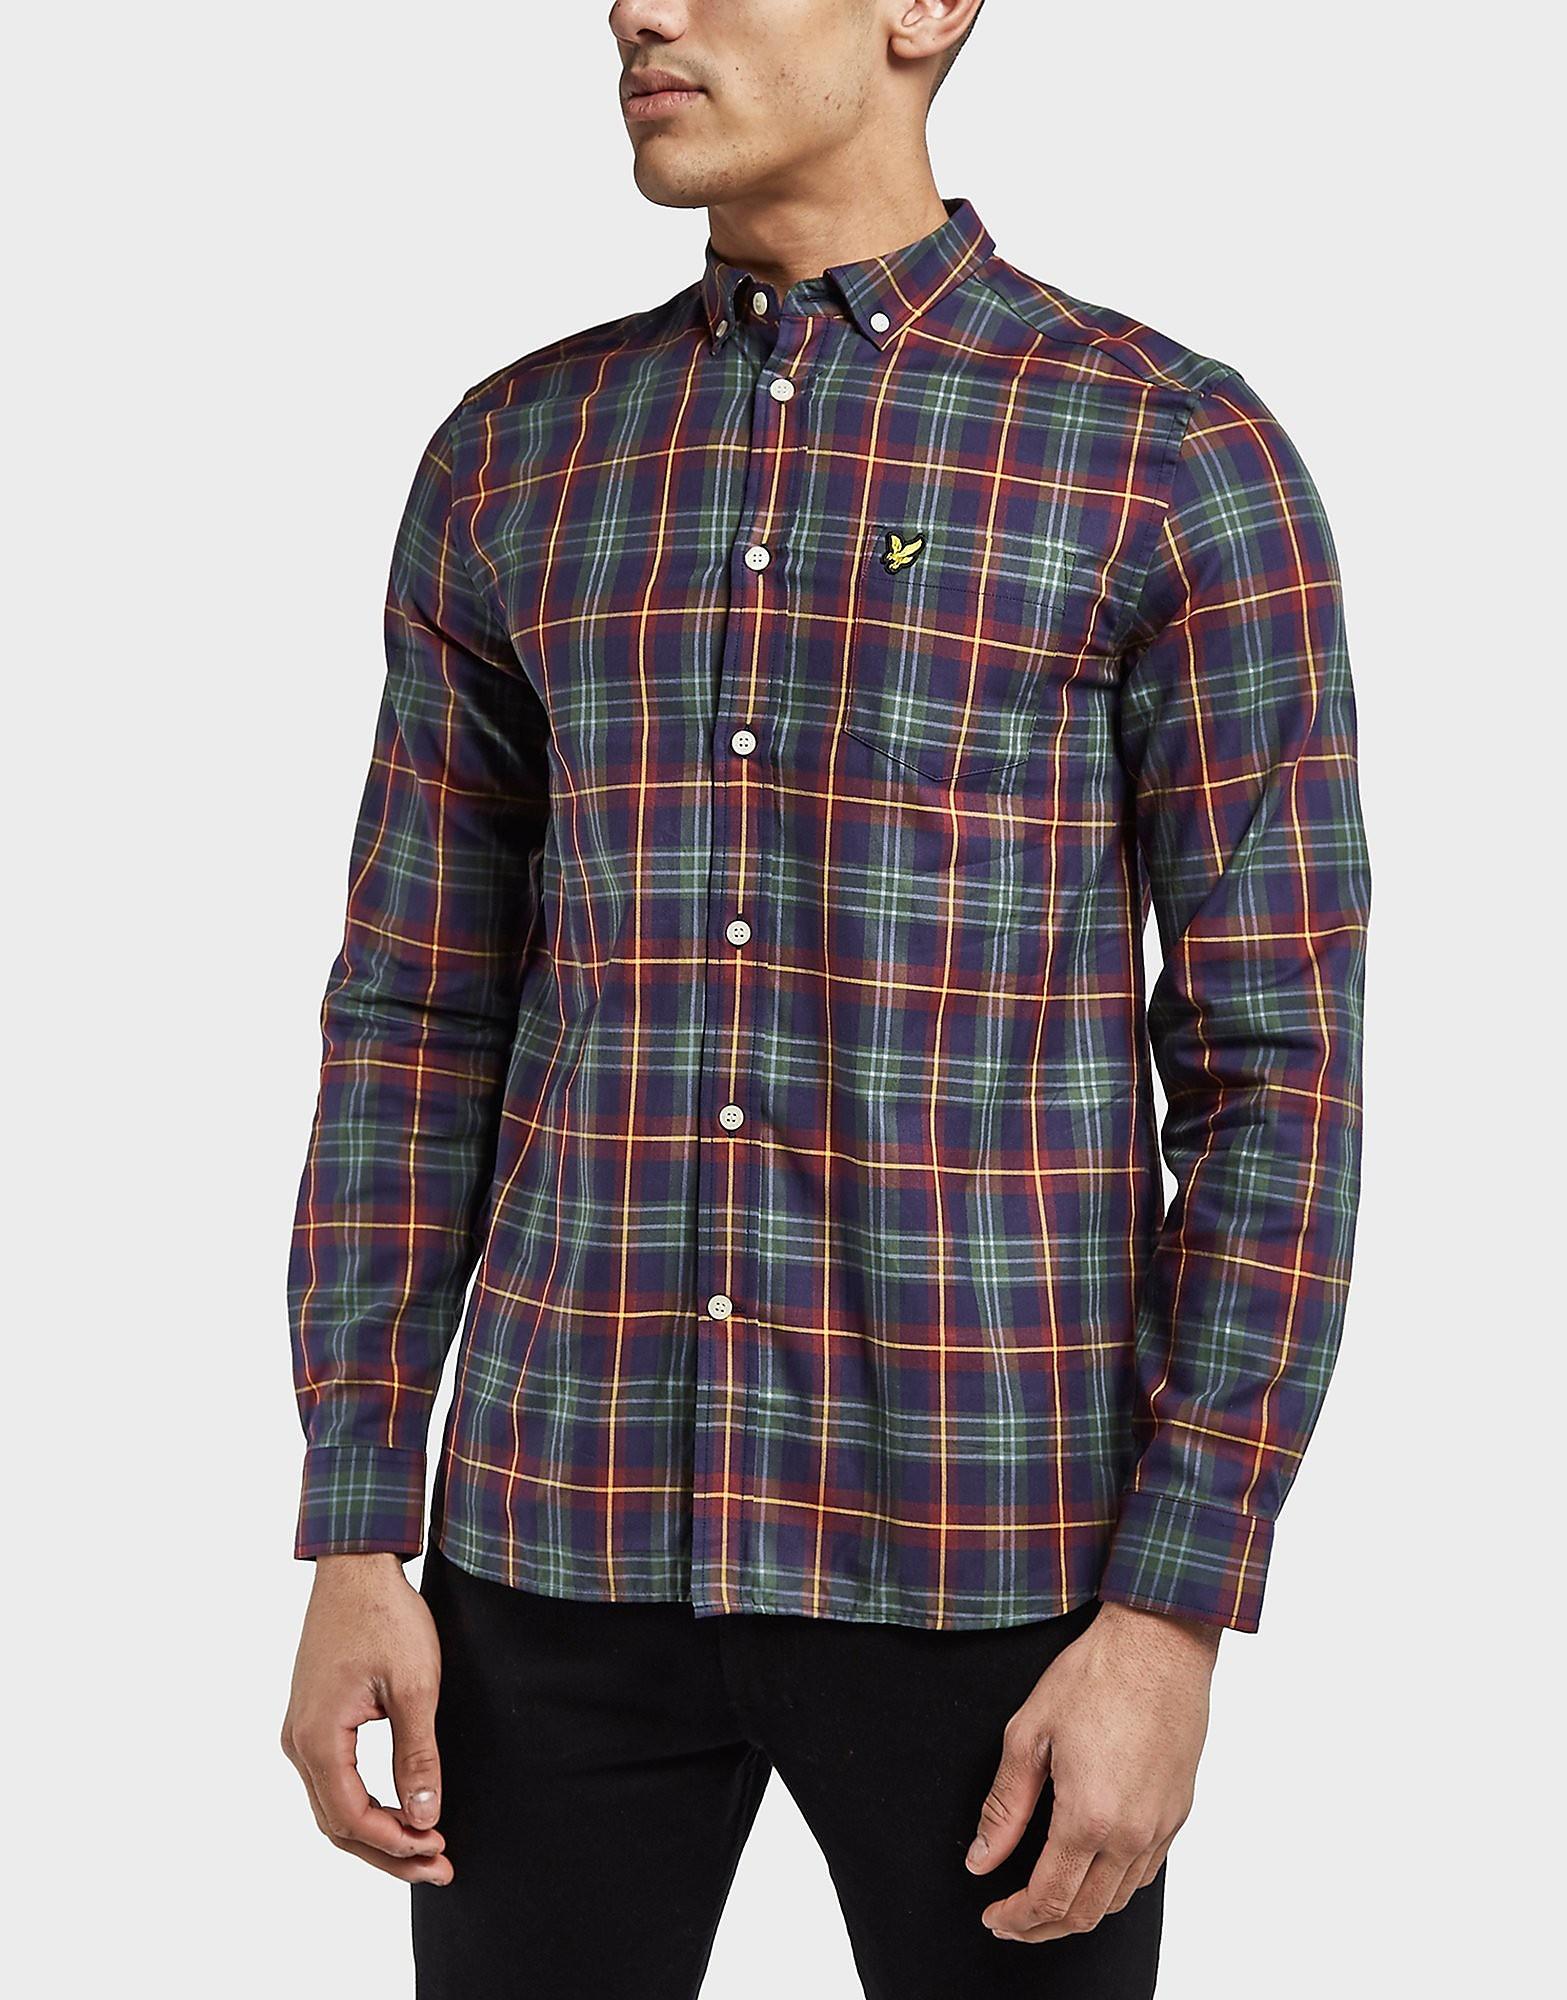 Lyle & Scott Check Long Sleeve Shirt - Exclusive